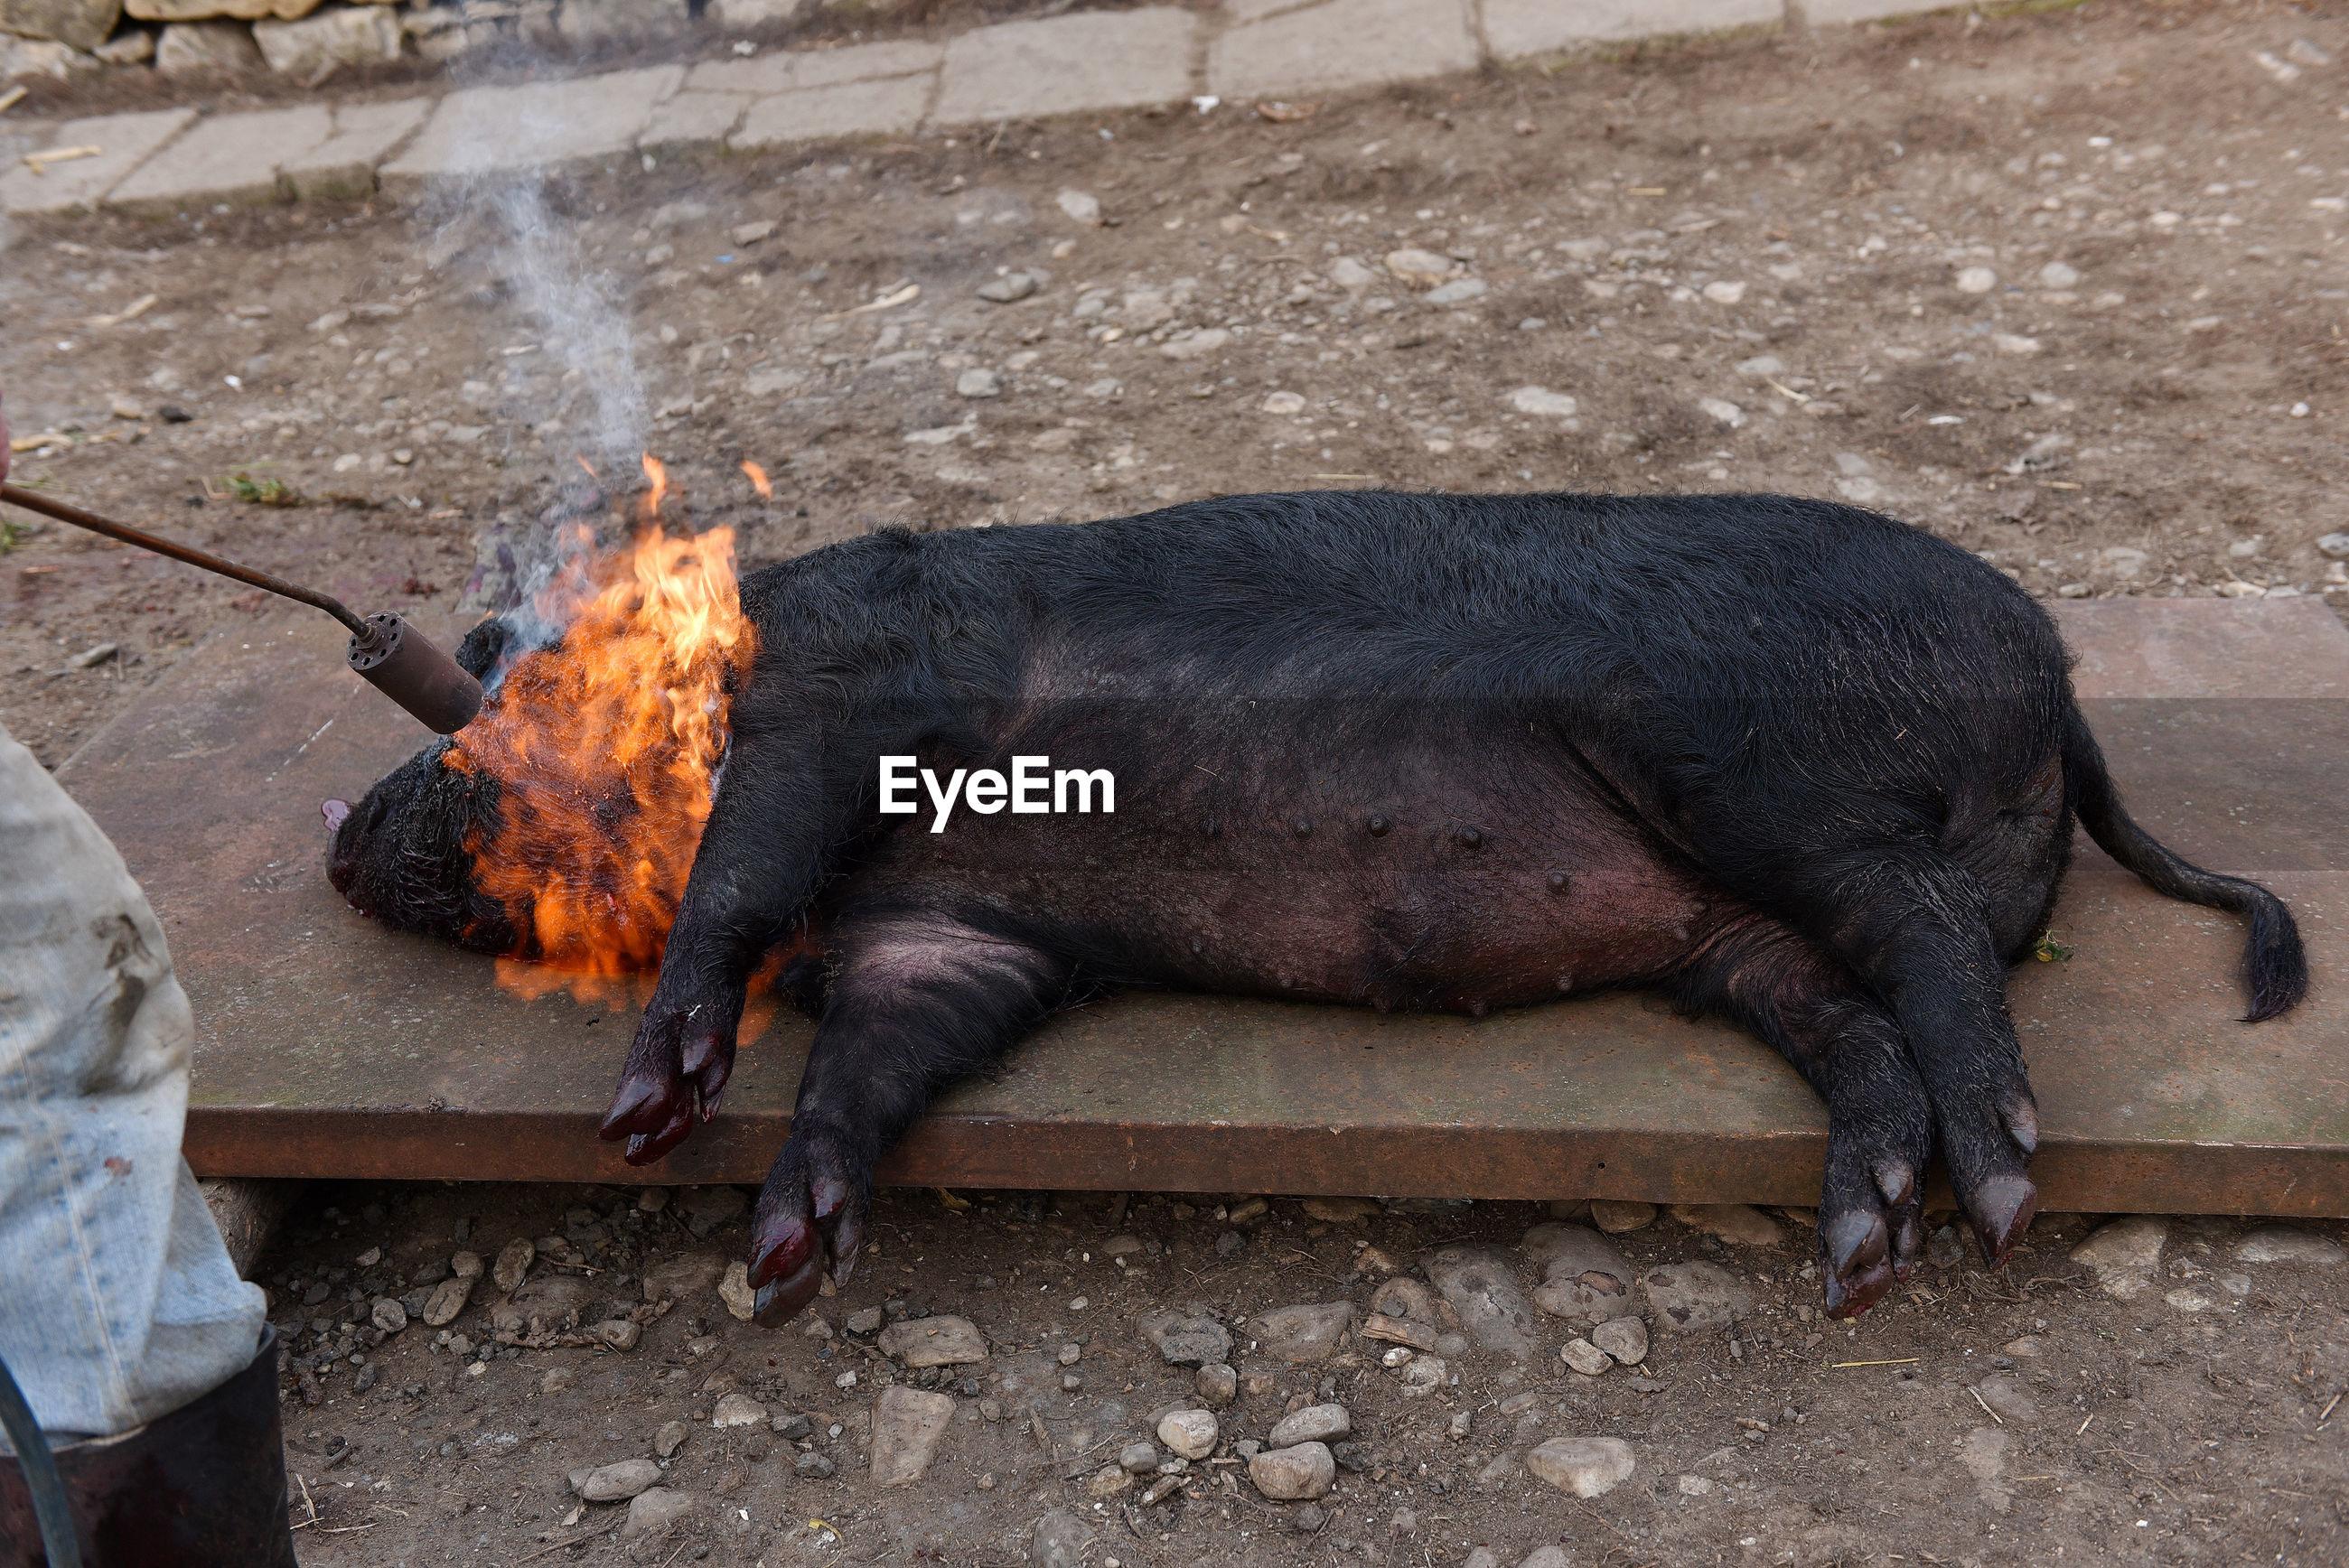 Cropped image of butcher burning pig on metal